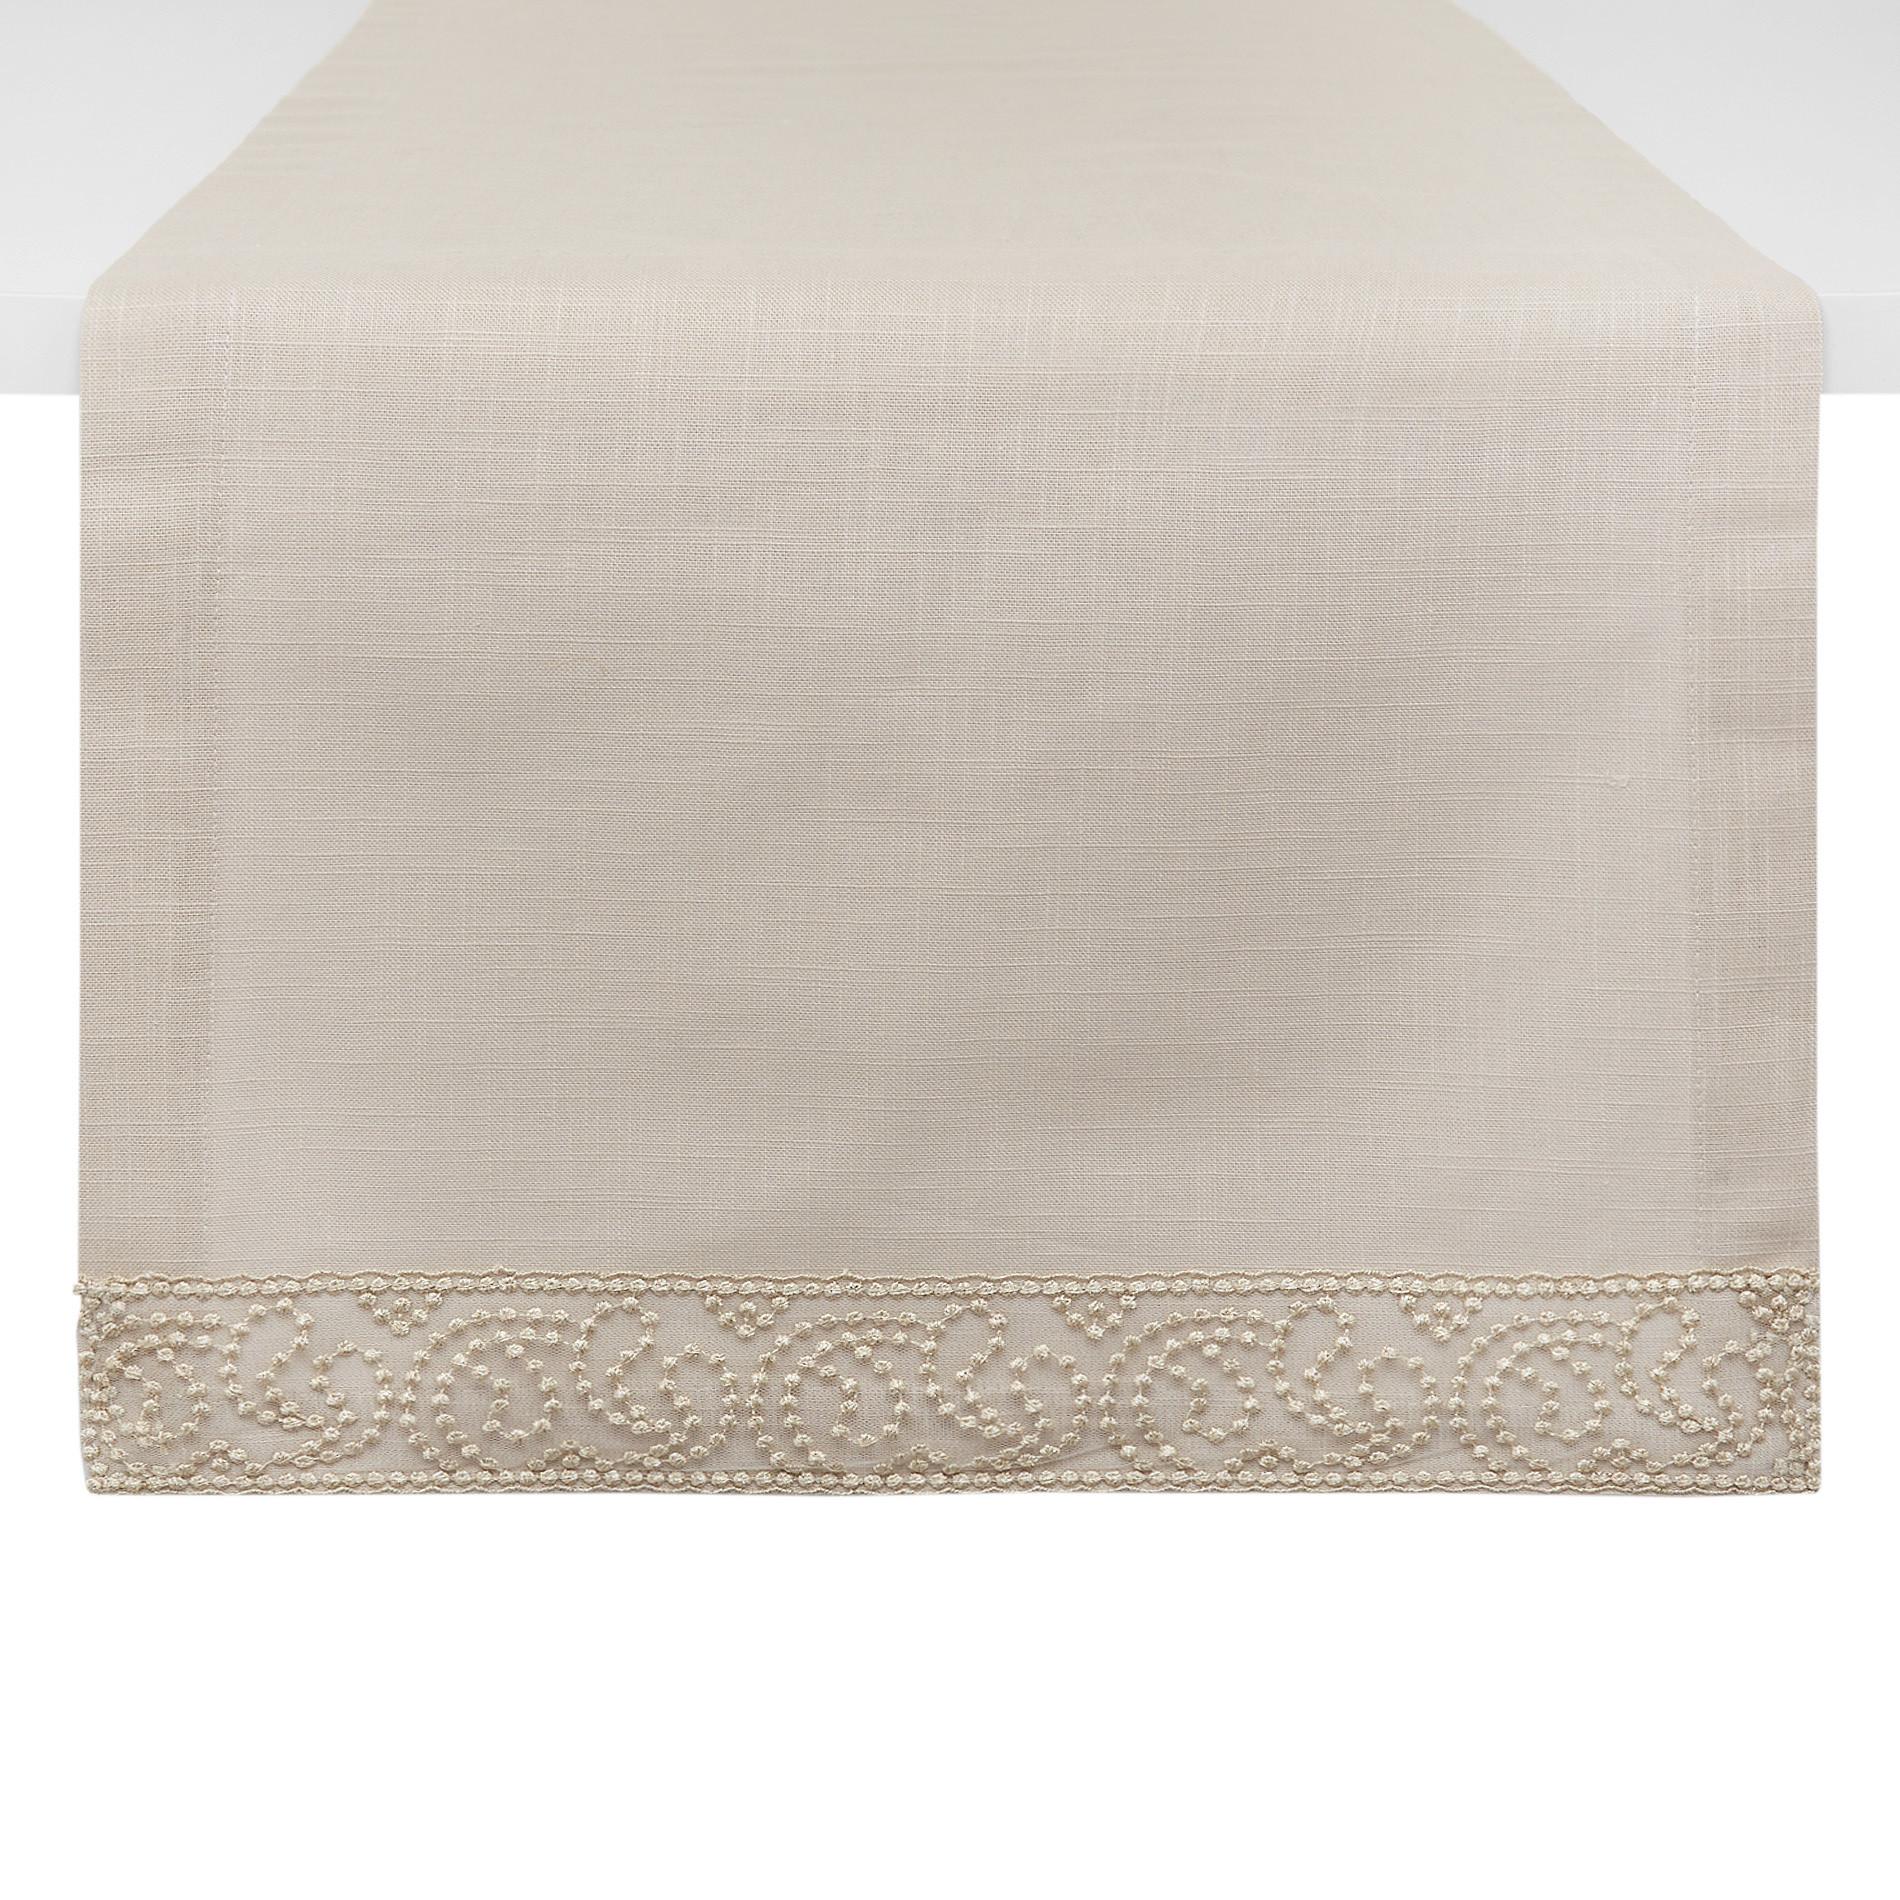 Runner puro cotone bordo in tulle e lurex, Beige chiaro, large image number 0